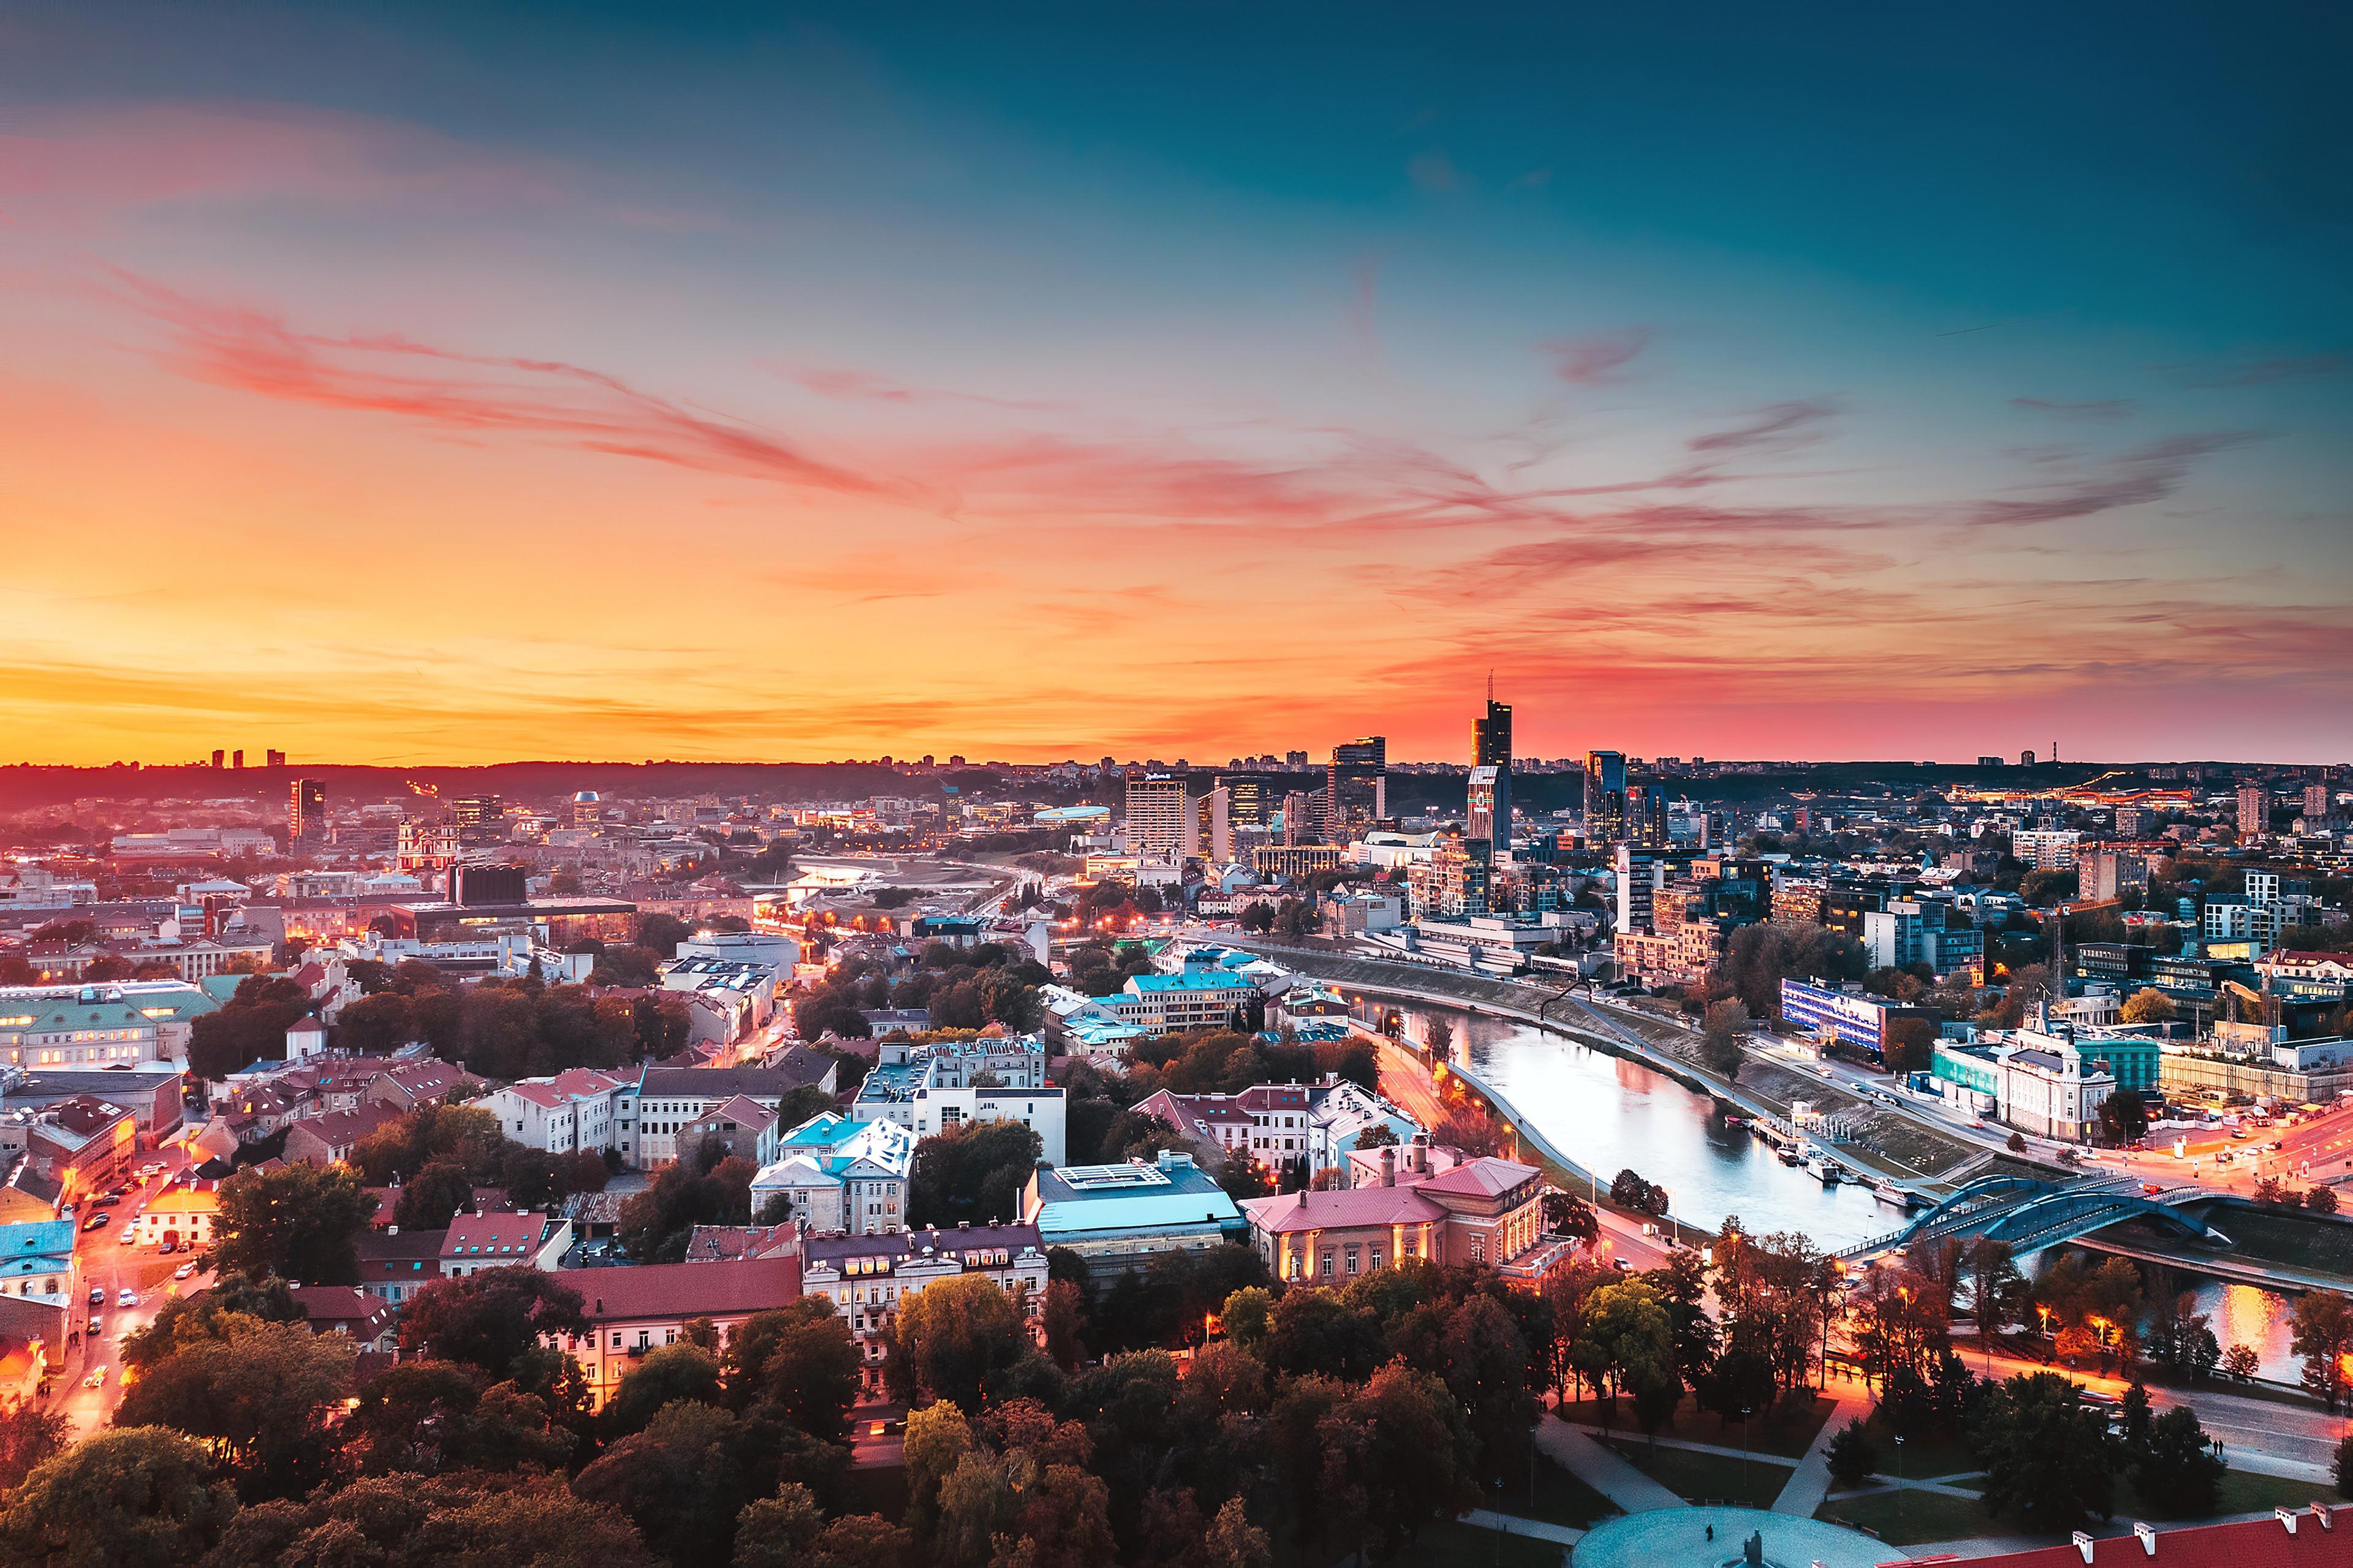 vilnius cityscape 4k 1596916651 - Vilnius Cityscape 4k -